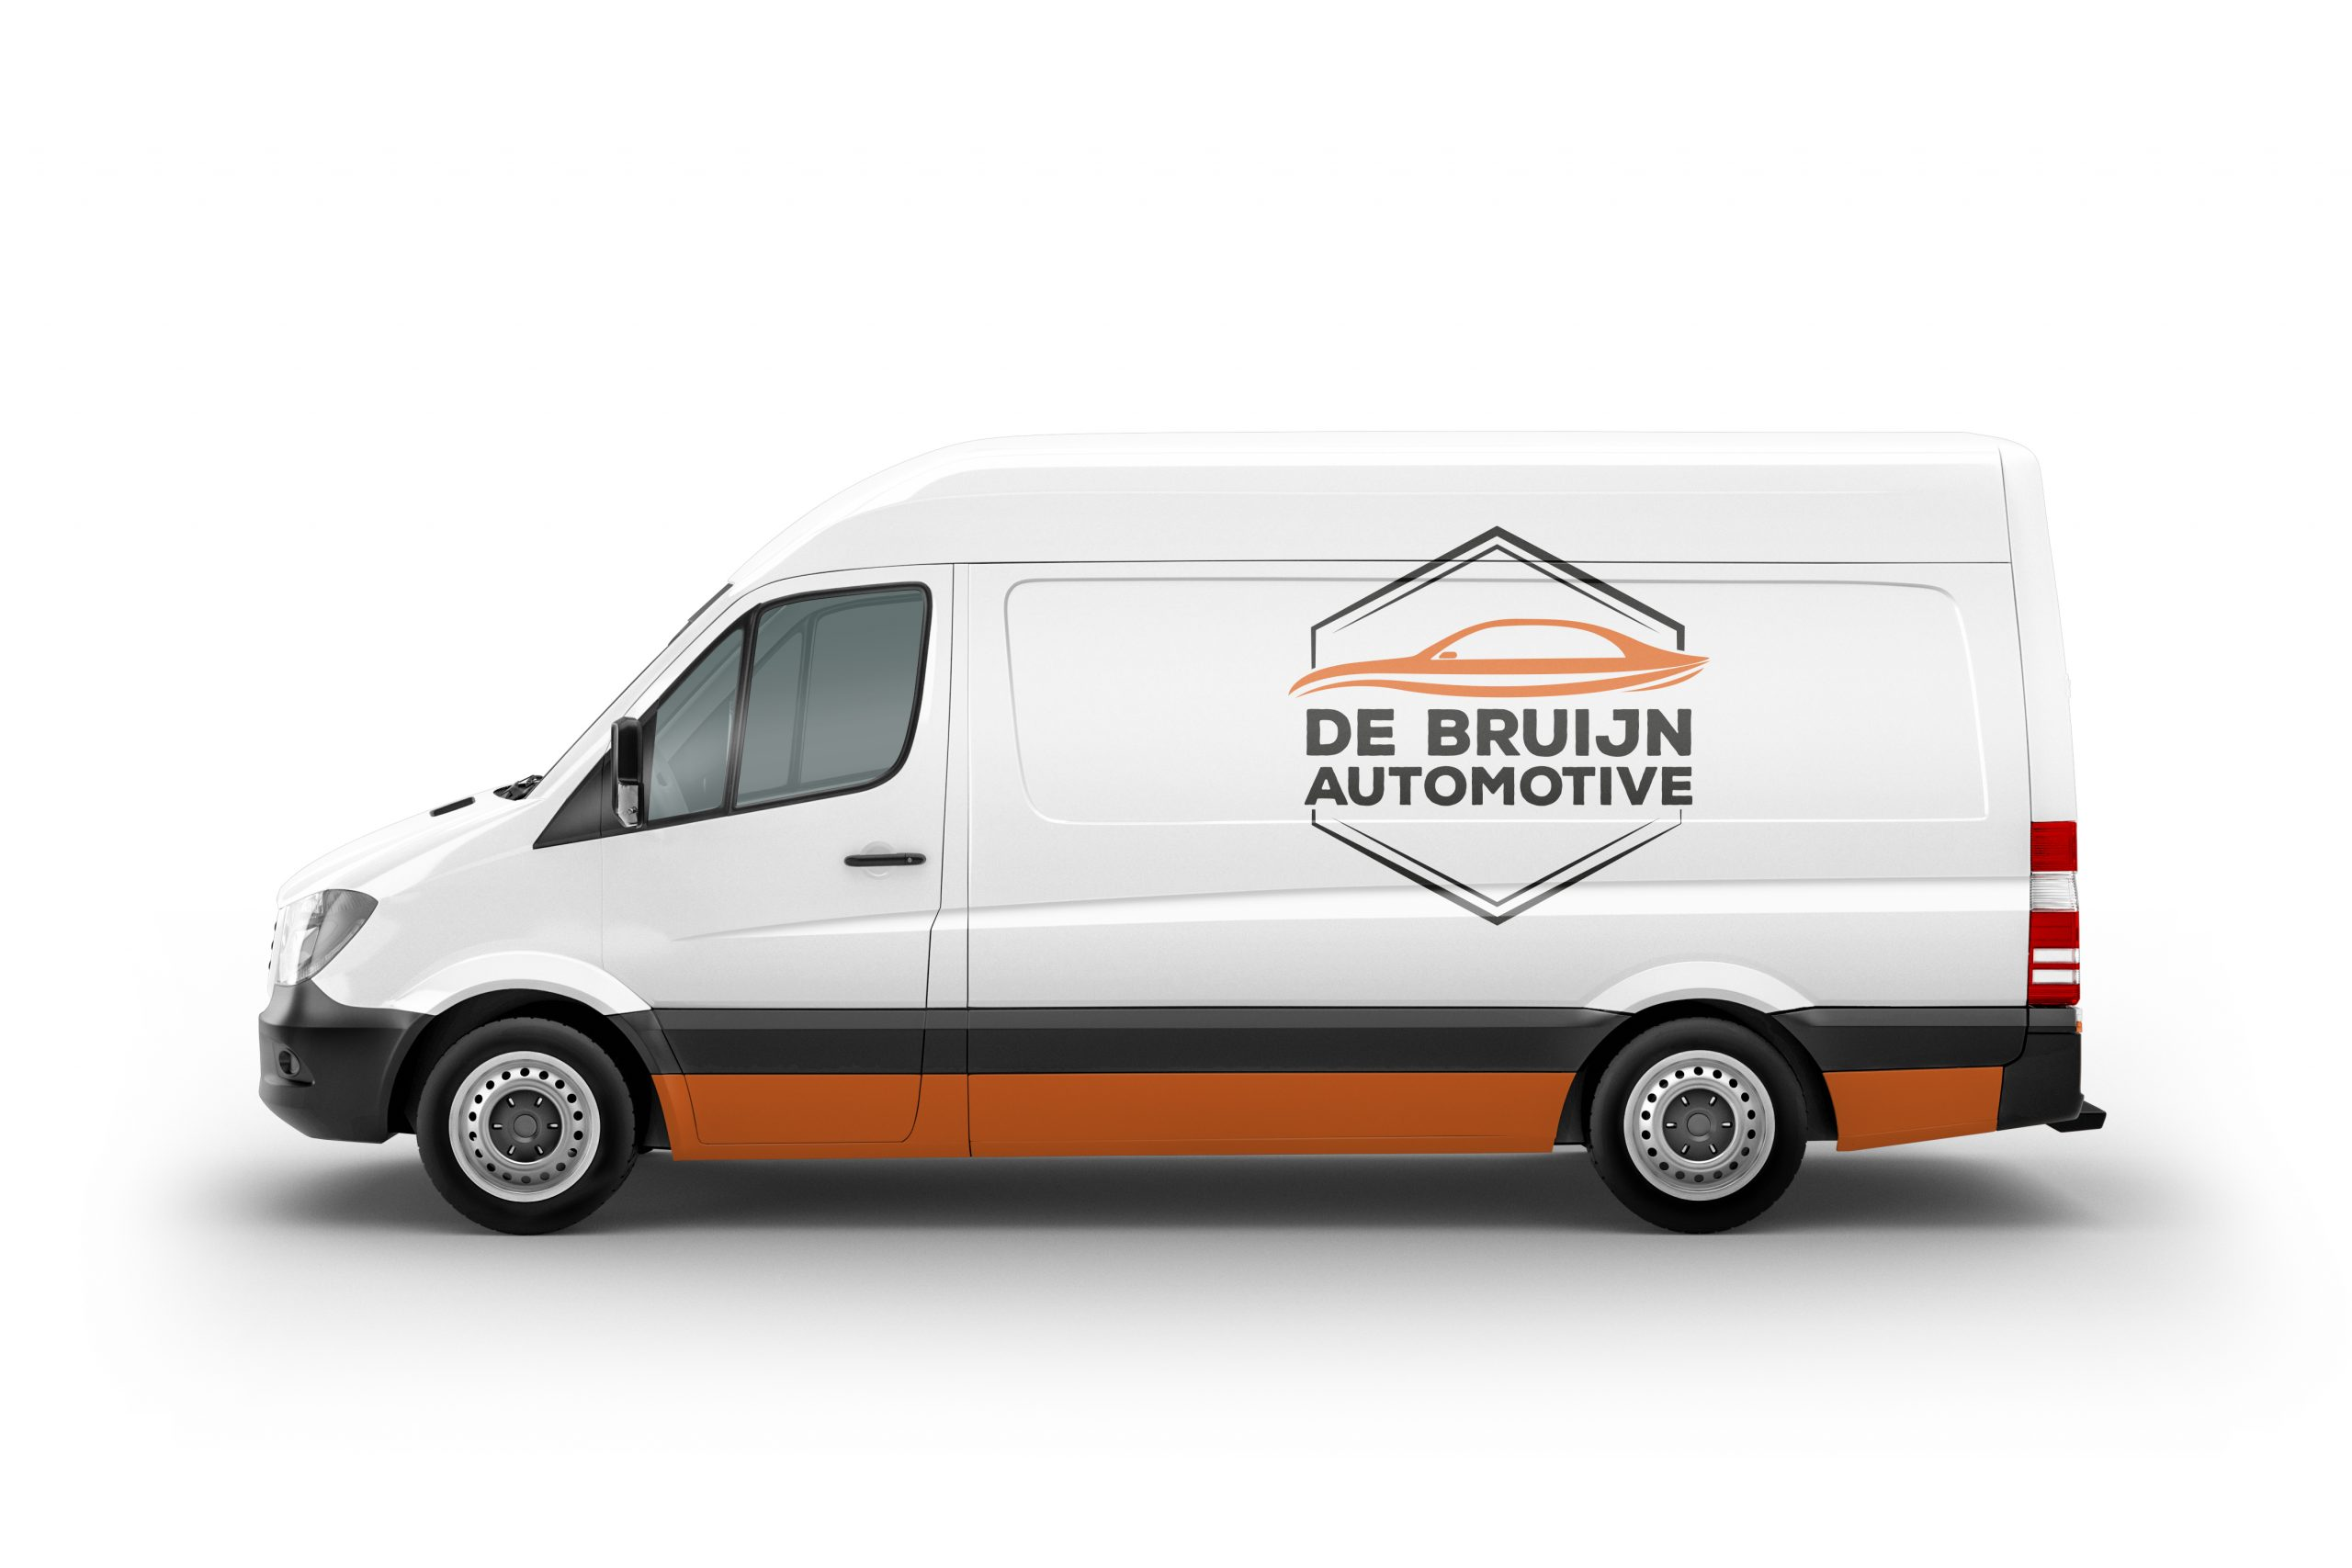 De Bruijn automotive logo